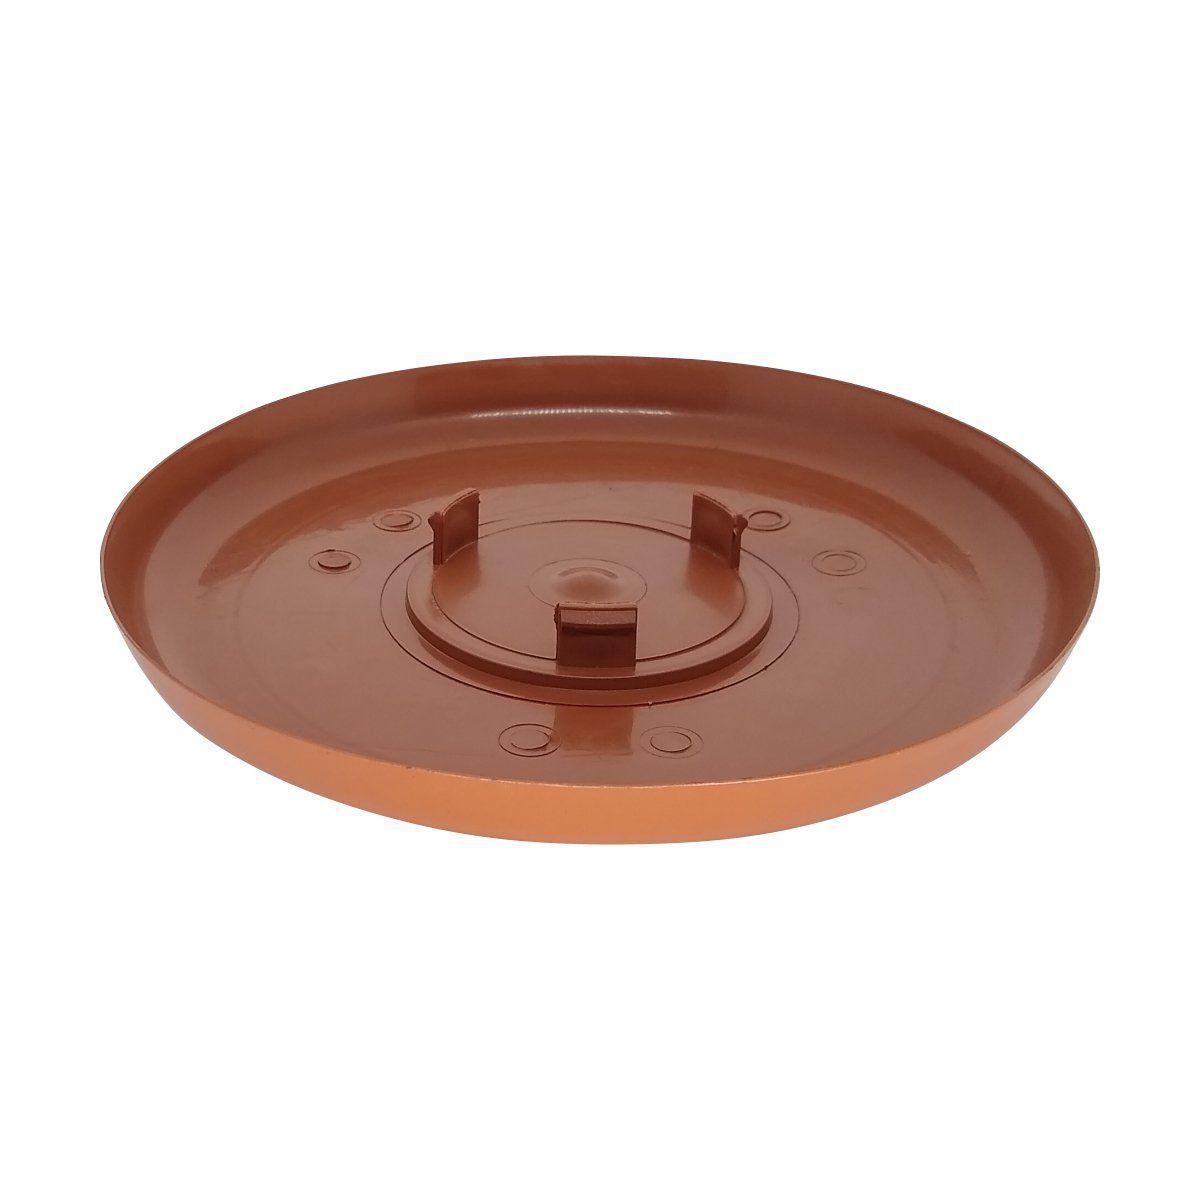 Kit Cuia Completo Nº 001 Cor Cerâmica 12cm x 22cm